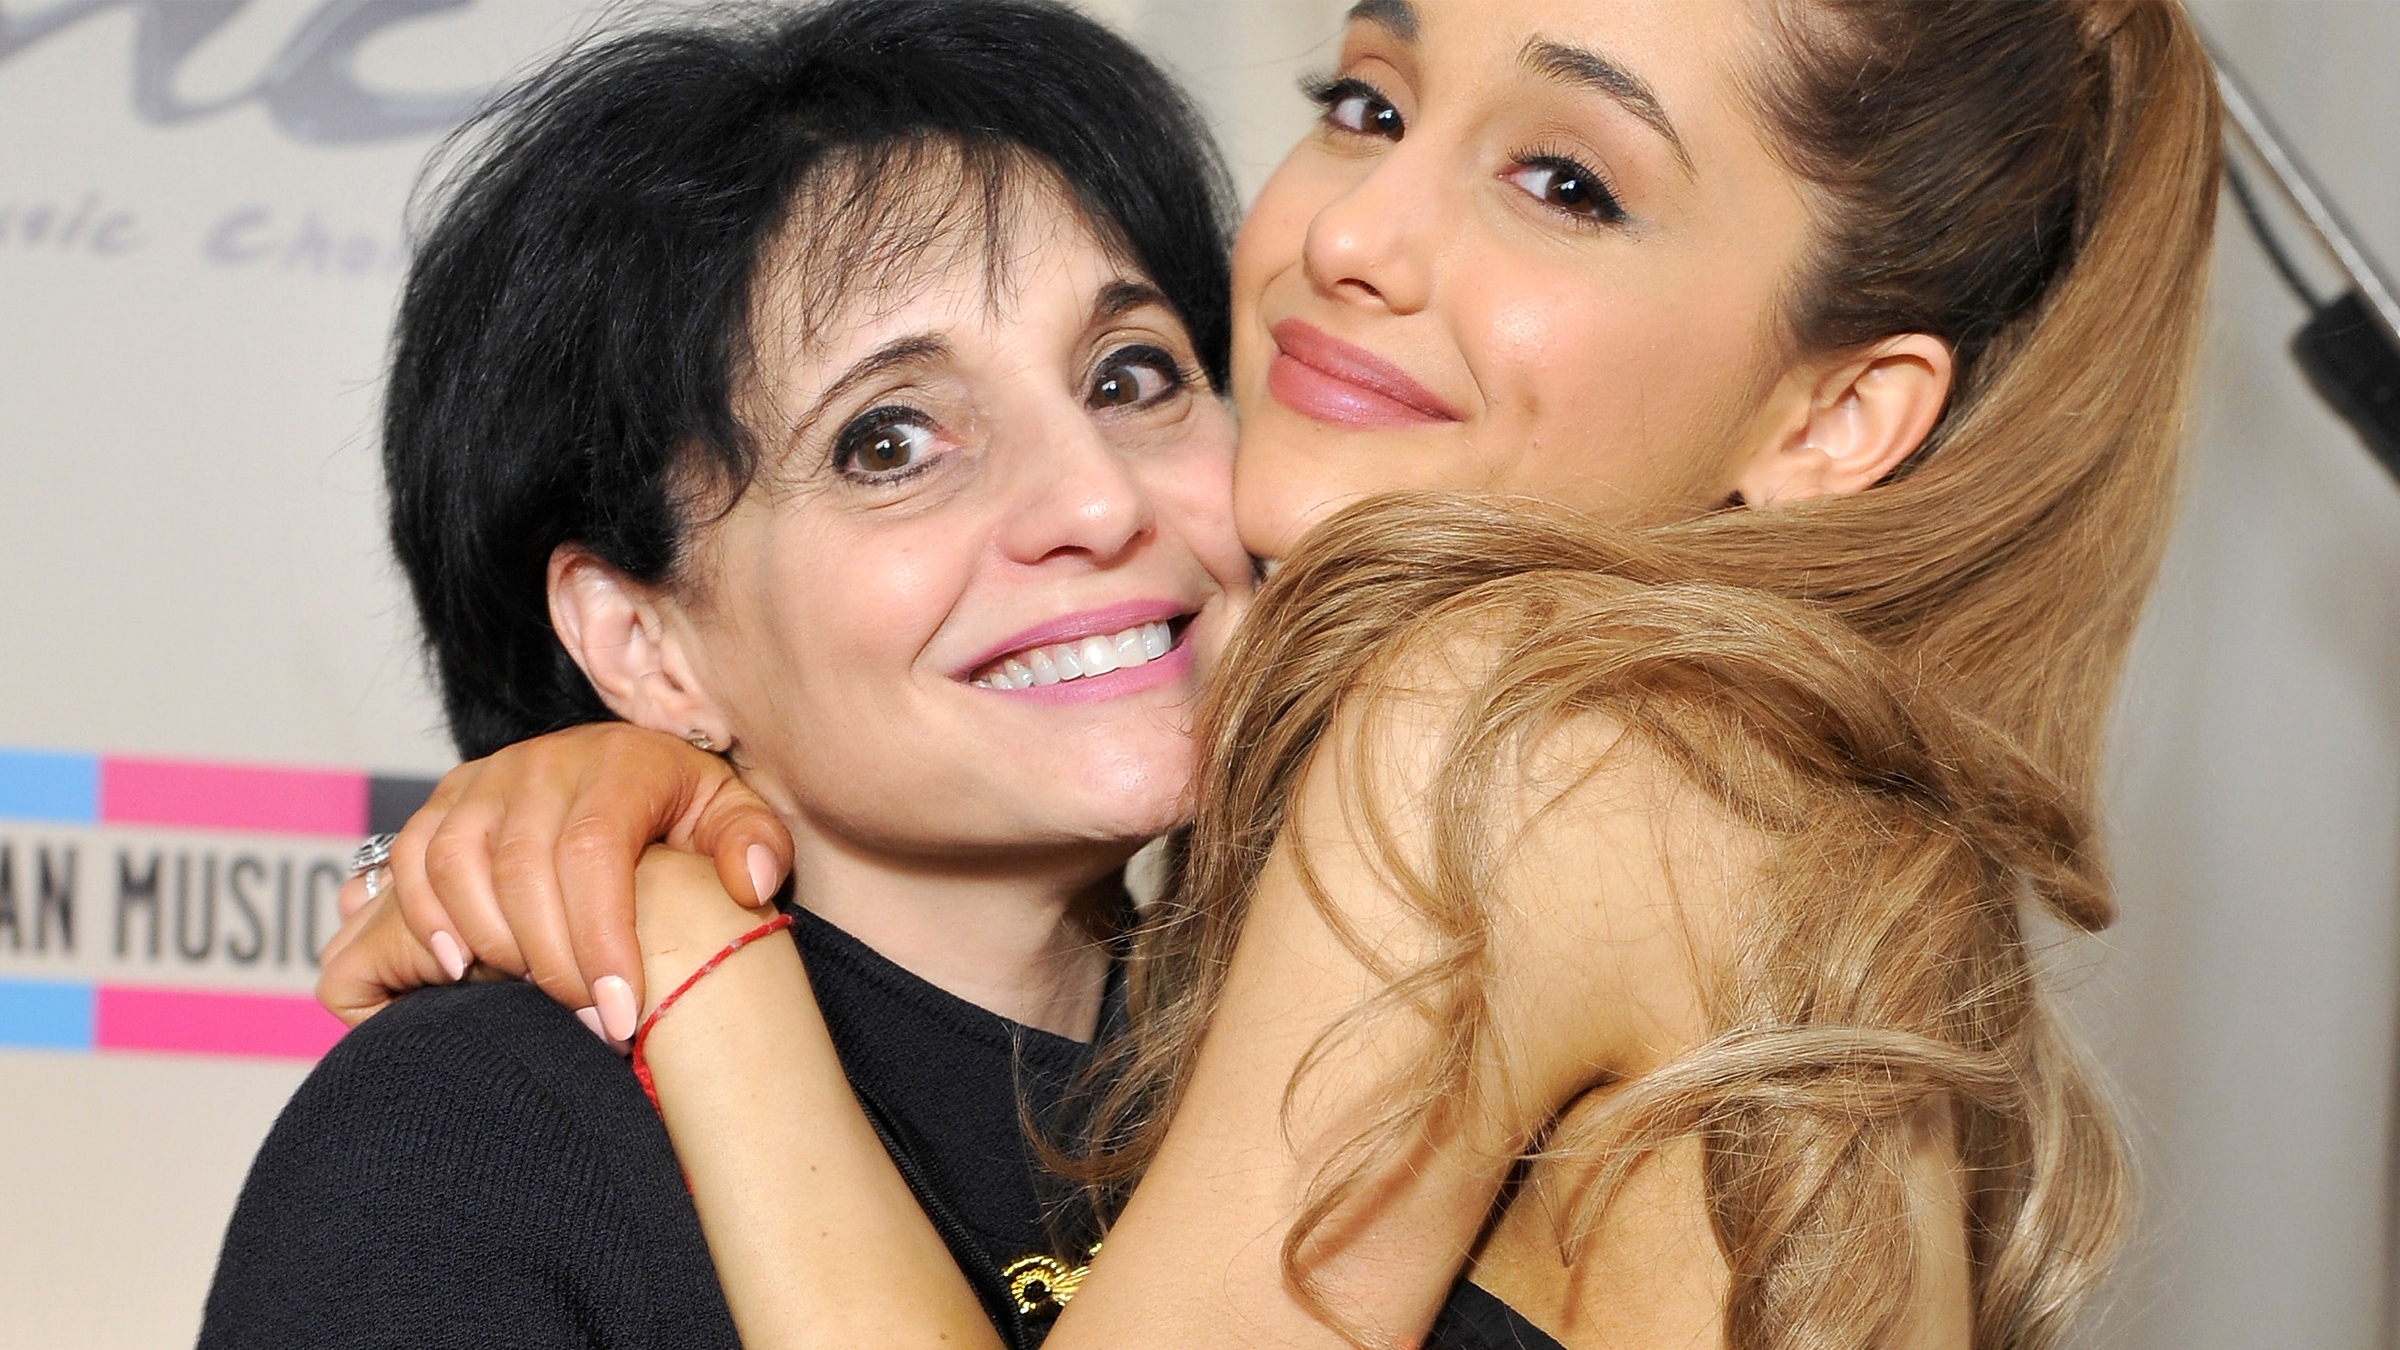 Ariana mama grande